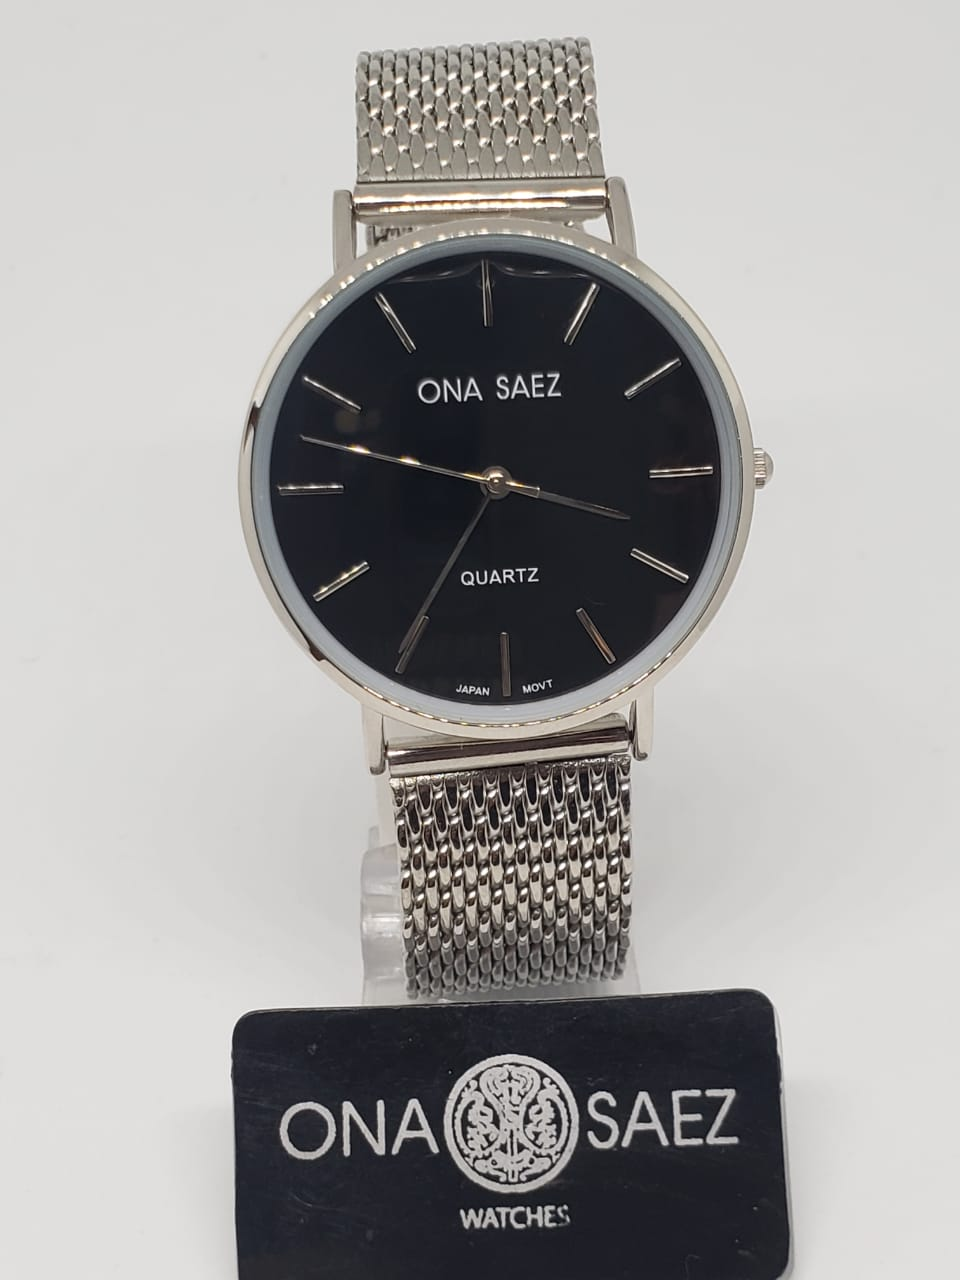 33663825fcd0 Reloj Ona Saez Unisex malla tejida – Joyas Lan